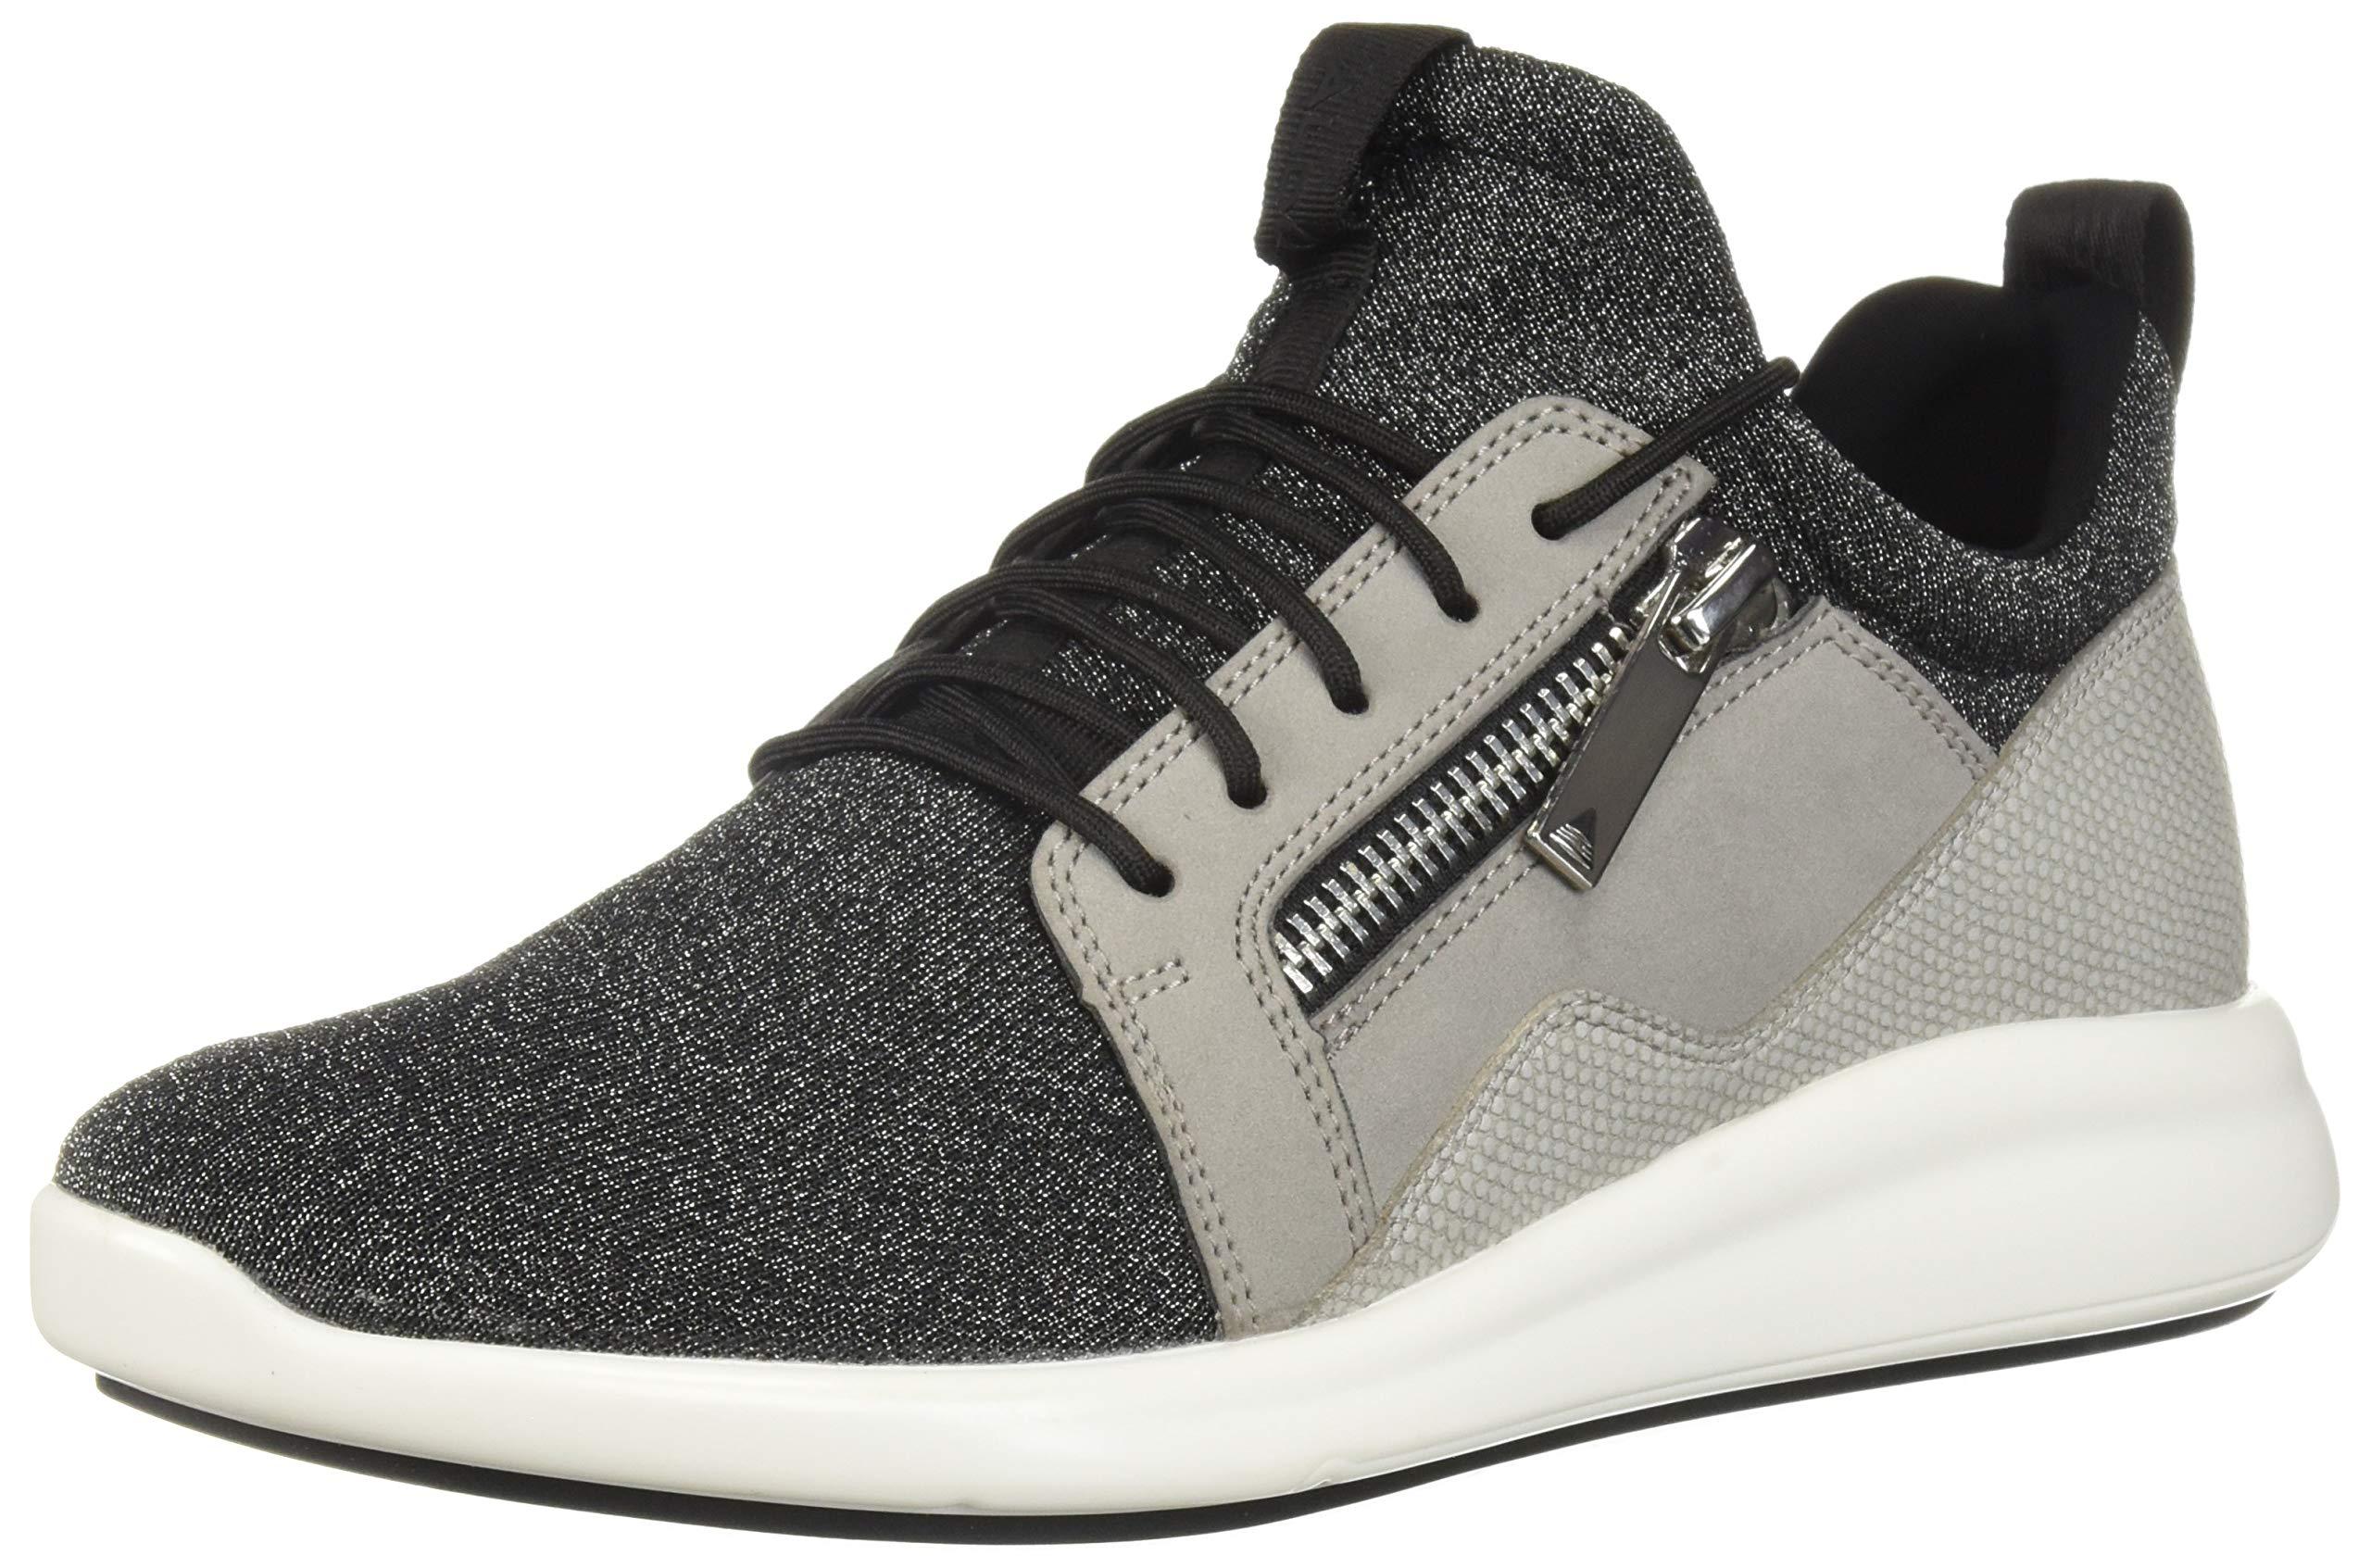 ویکالا · خرید  اصل اورجینال · خرید از آمازون · ALDO Men's CADERUSCHI Sneaker, Silver, 11 D US wekala · ویکالا